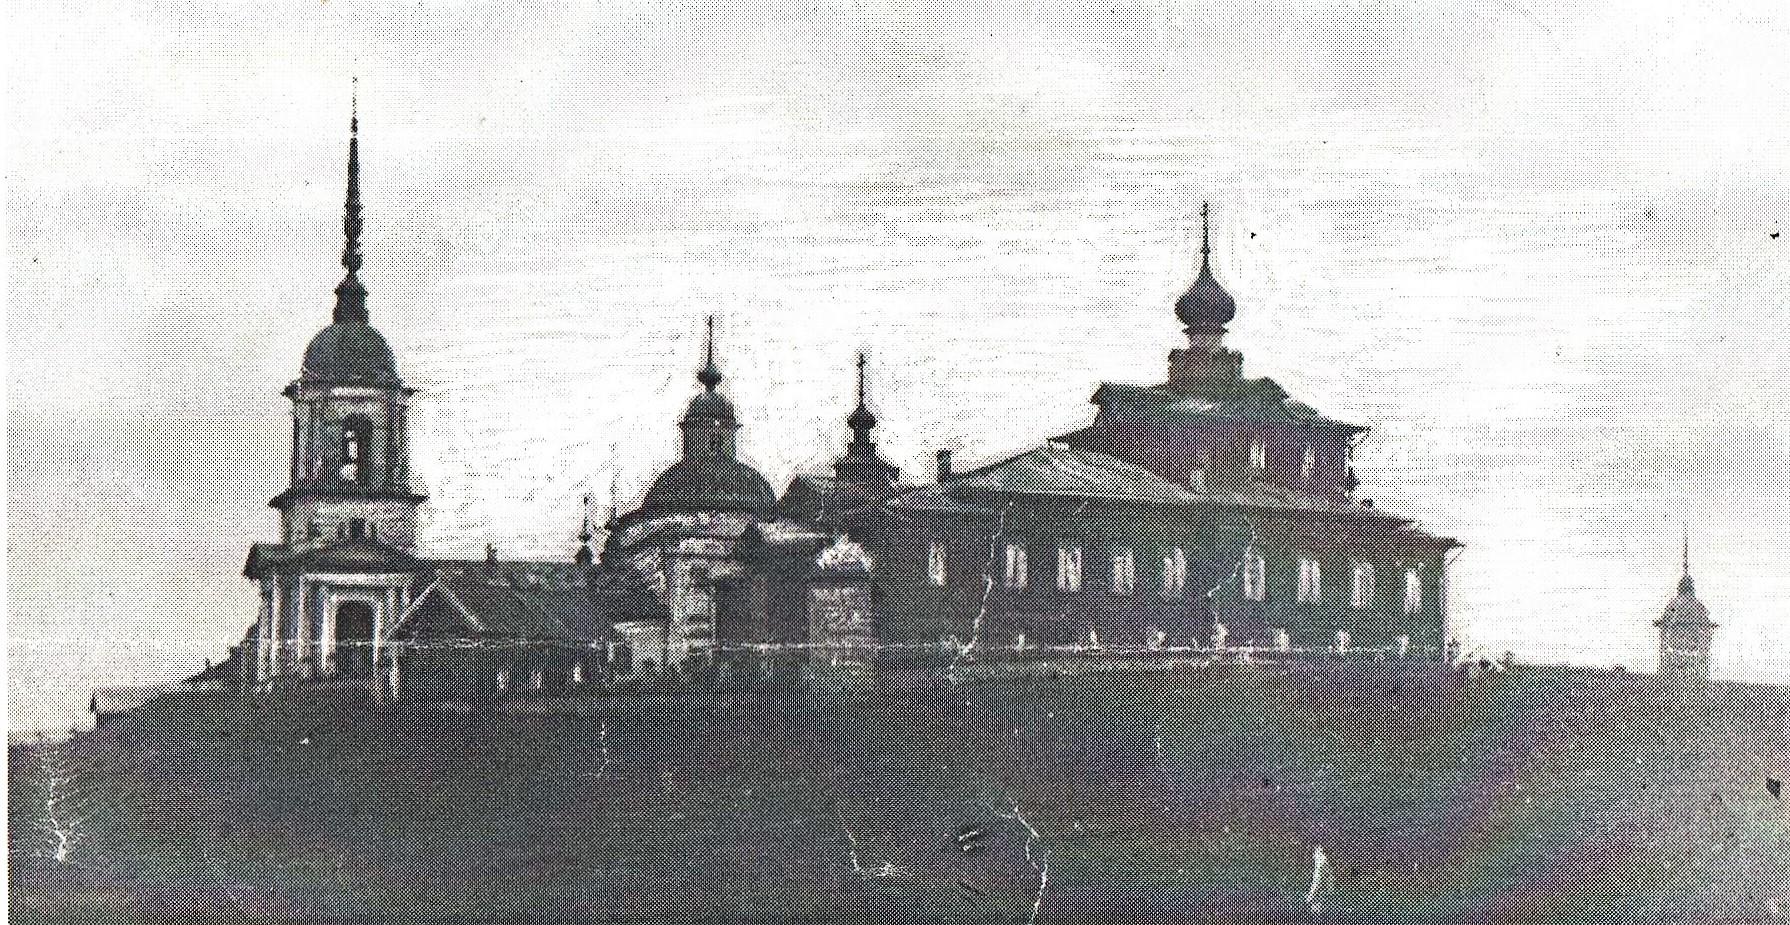 Фото 1930-го года, деревня Поповка Коношского района